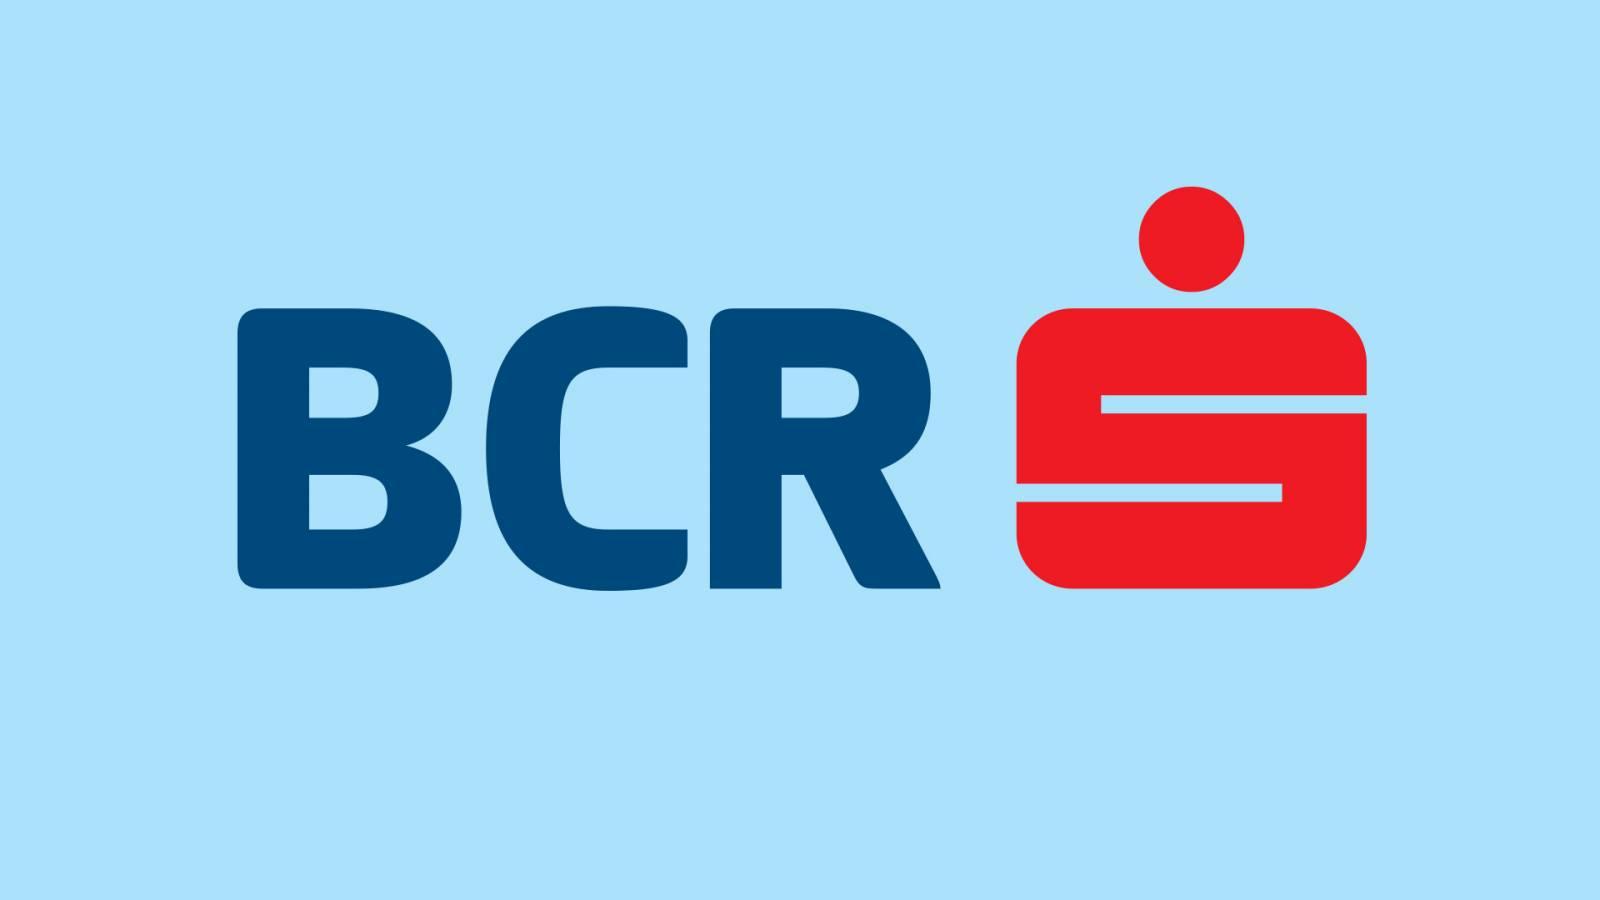 BCR Romania pad